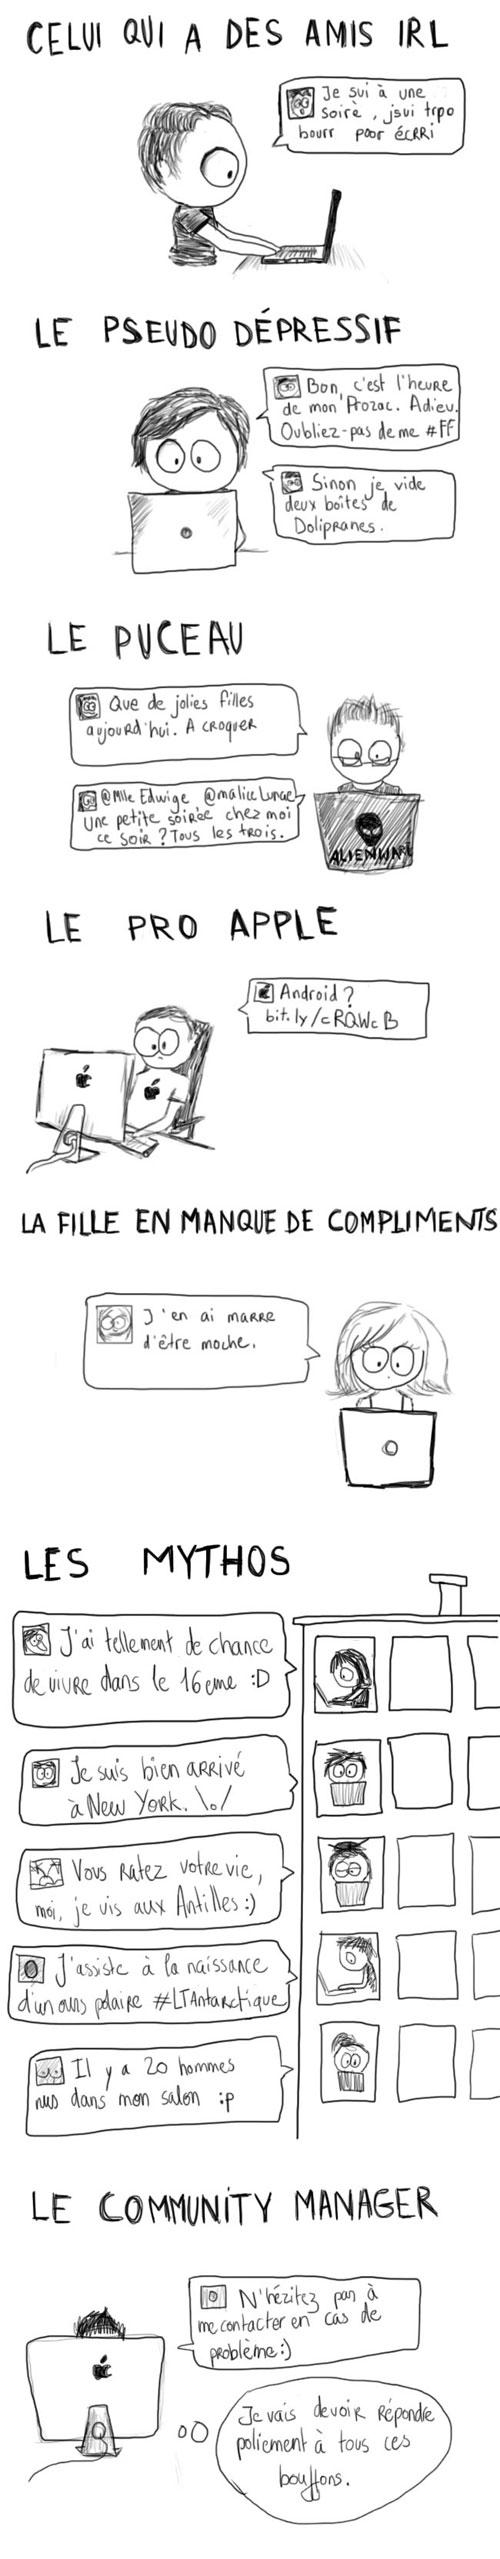 Twitter : Profils utilisateurs